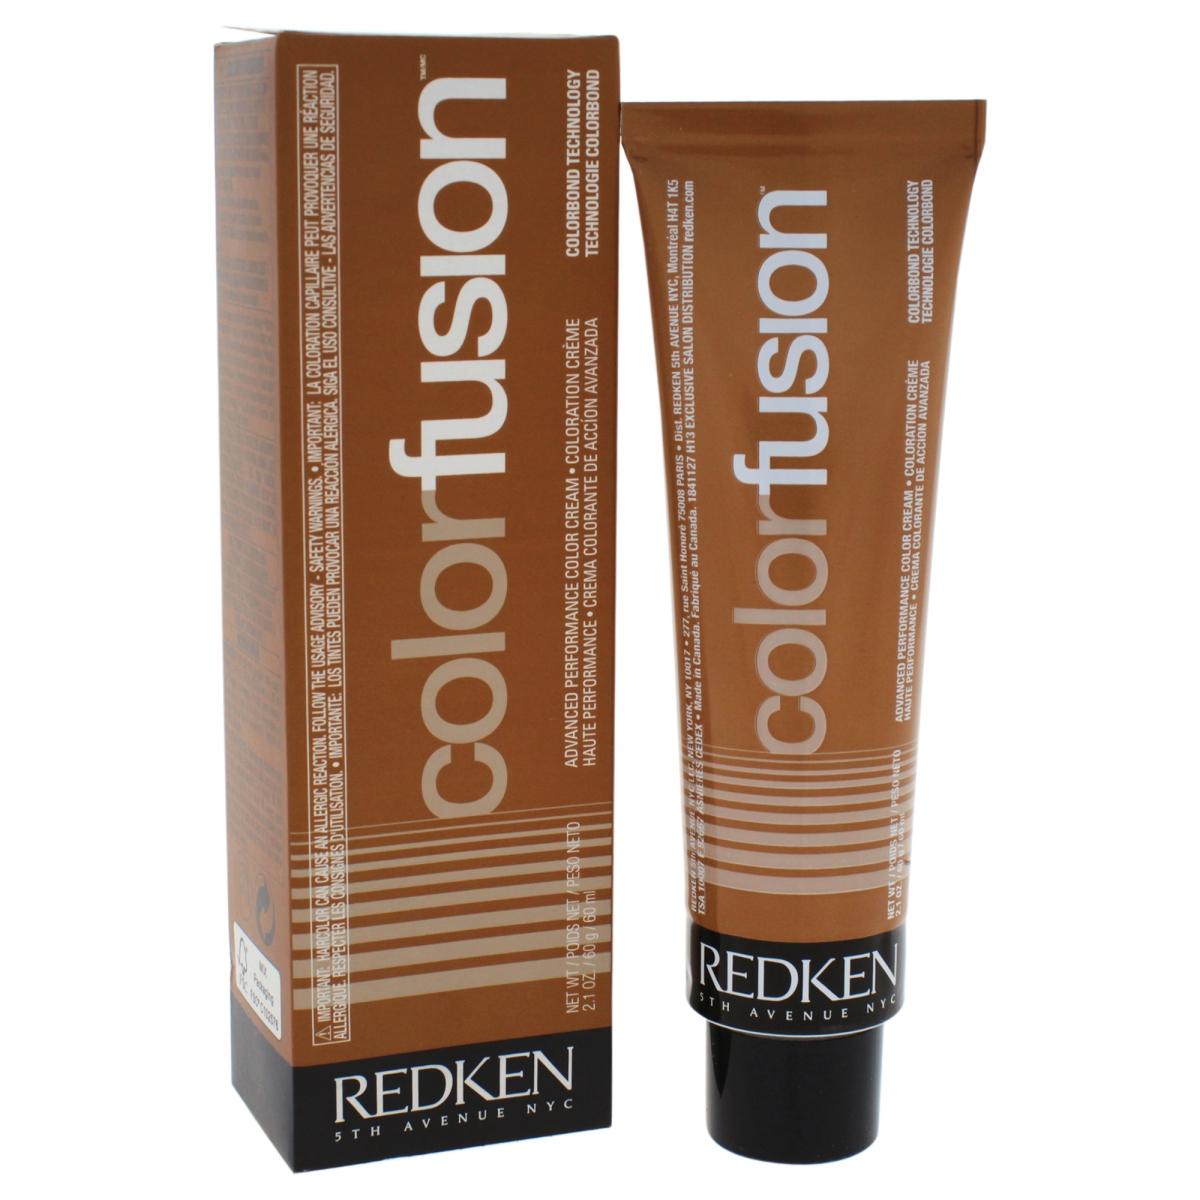 Redken U-HC-11733 2.1 oz Color Fusion Cream No. 3 Natural Fashion Hair Color for Unisex Gold Orange